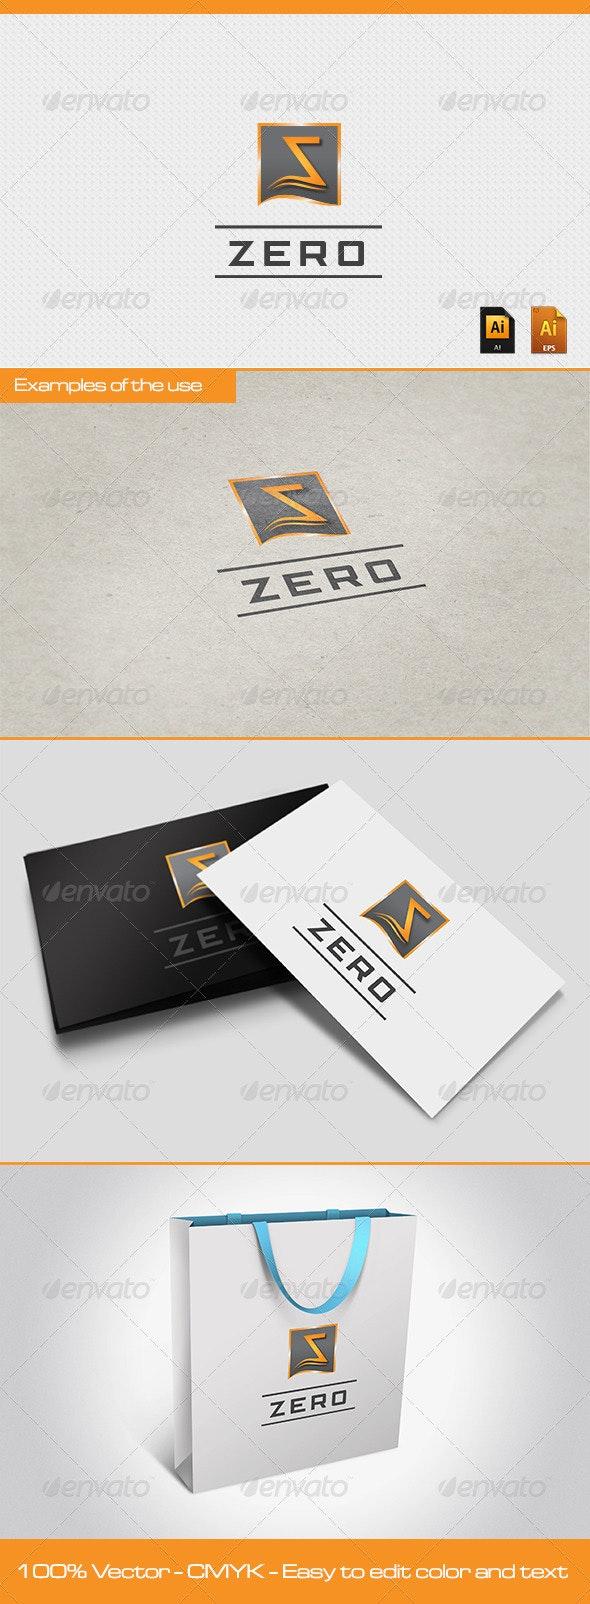 ZERO Logo Template - Symbols Logo Templates